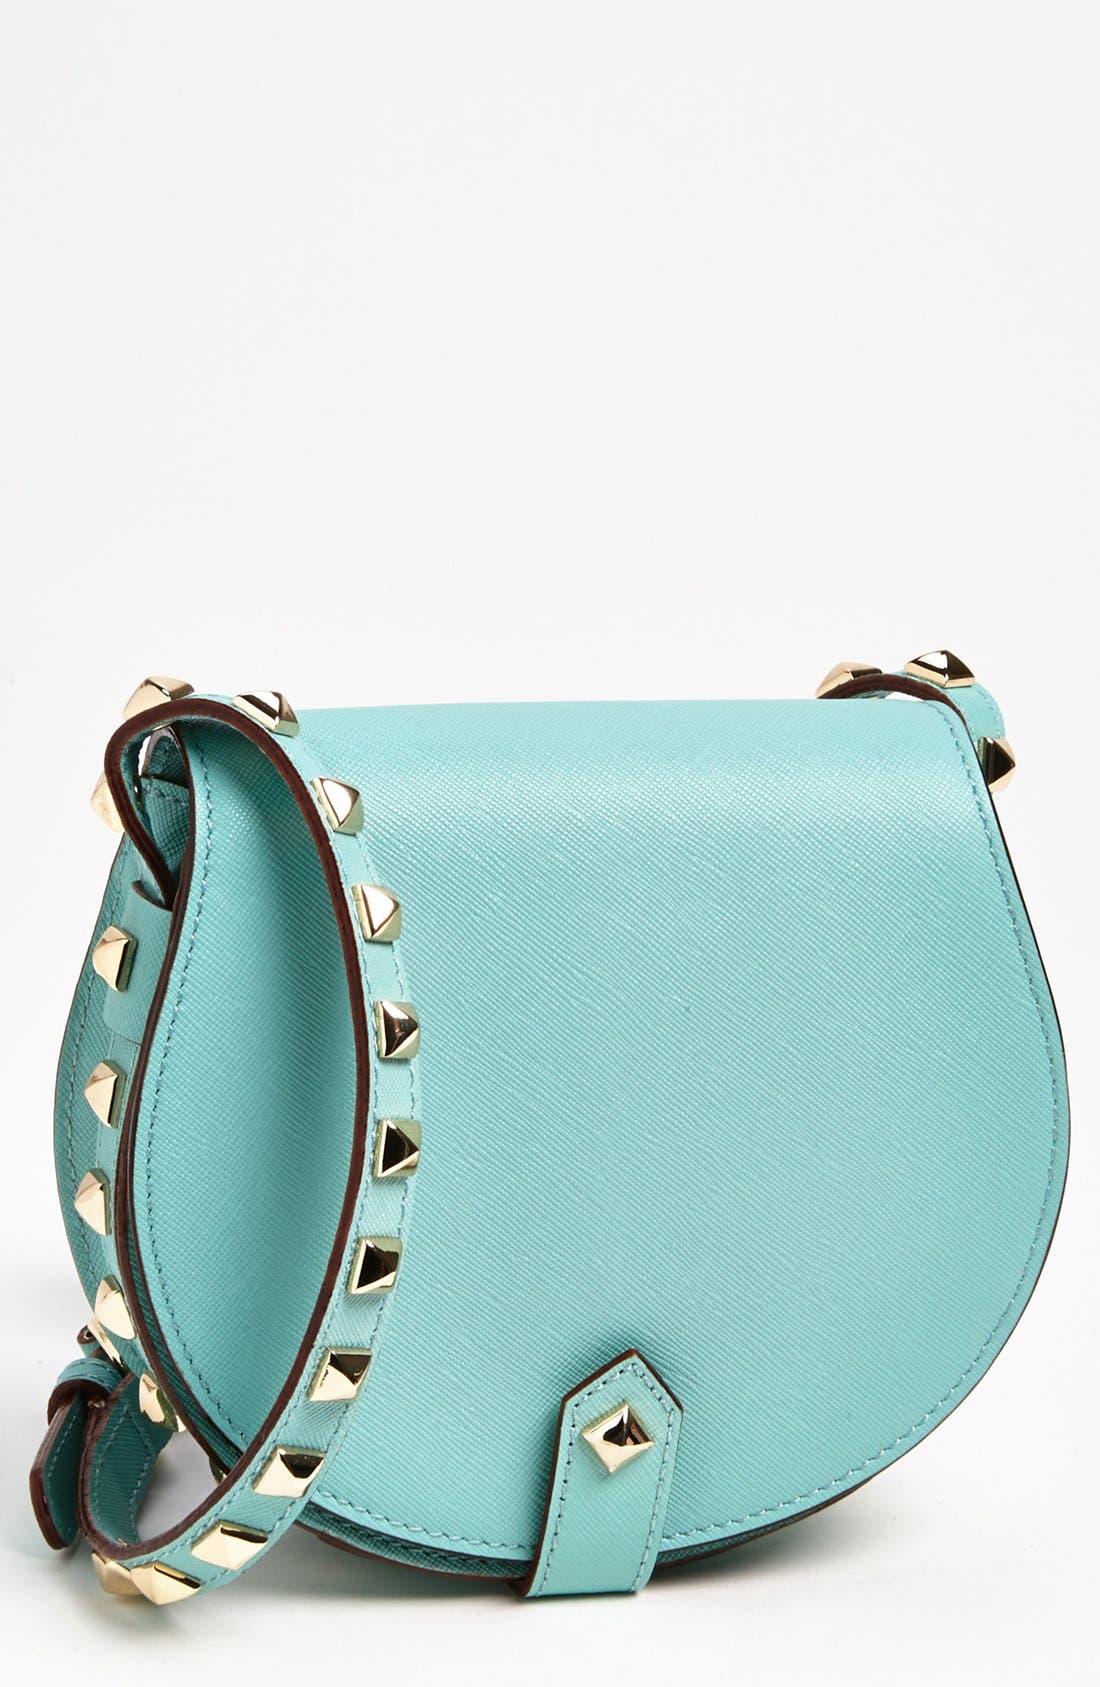 Main Image - Rebecca Minkoff 'Skylar - Mini' Leather Crossbody Bag